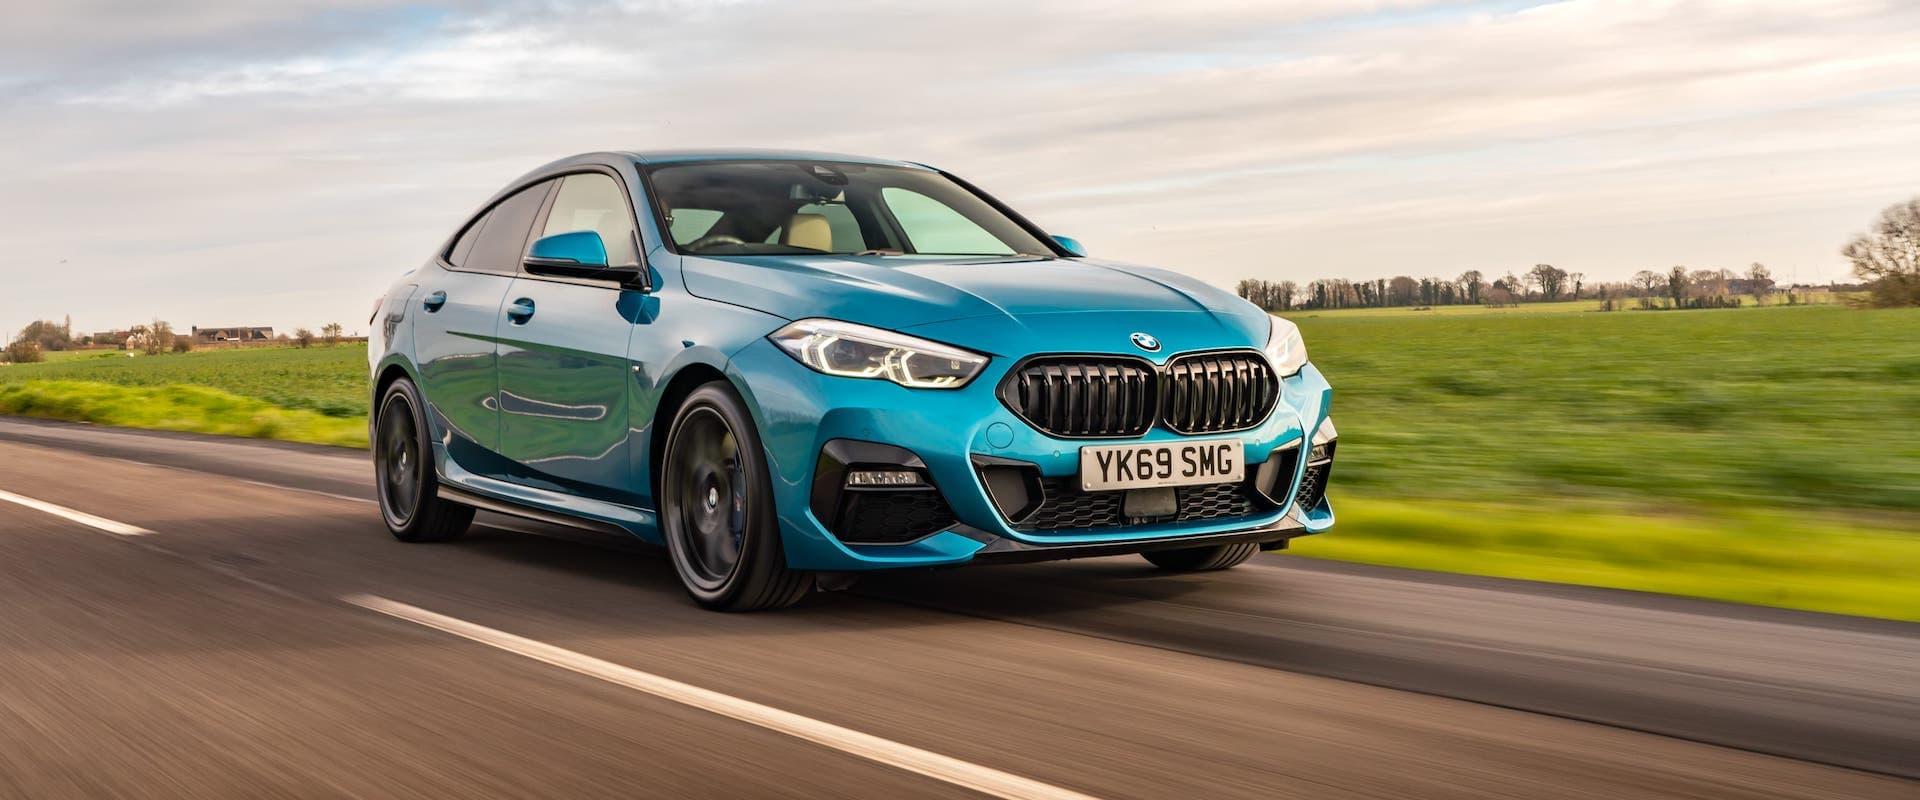 BMW 2 Series Gran Coupé review 2020